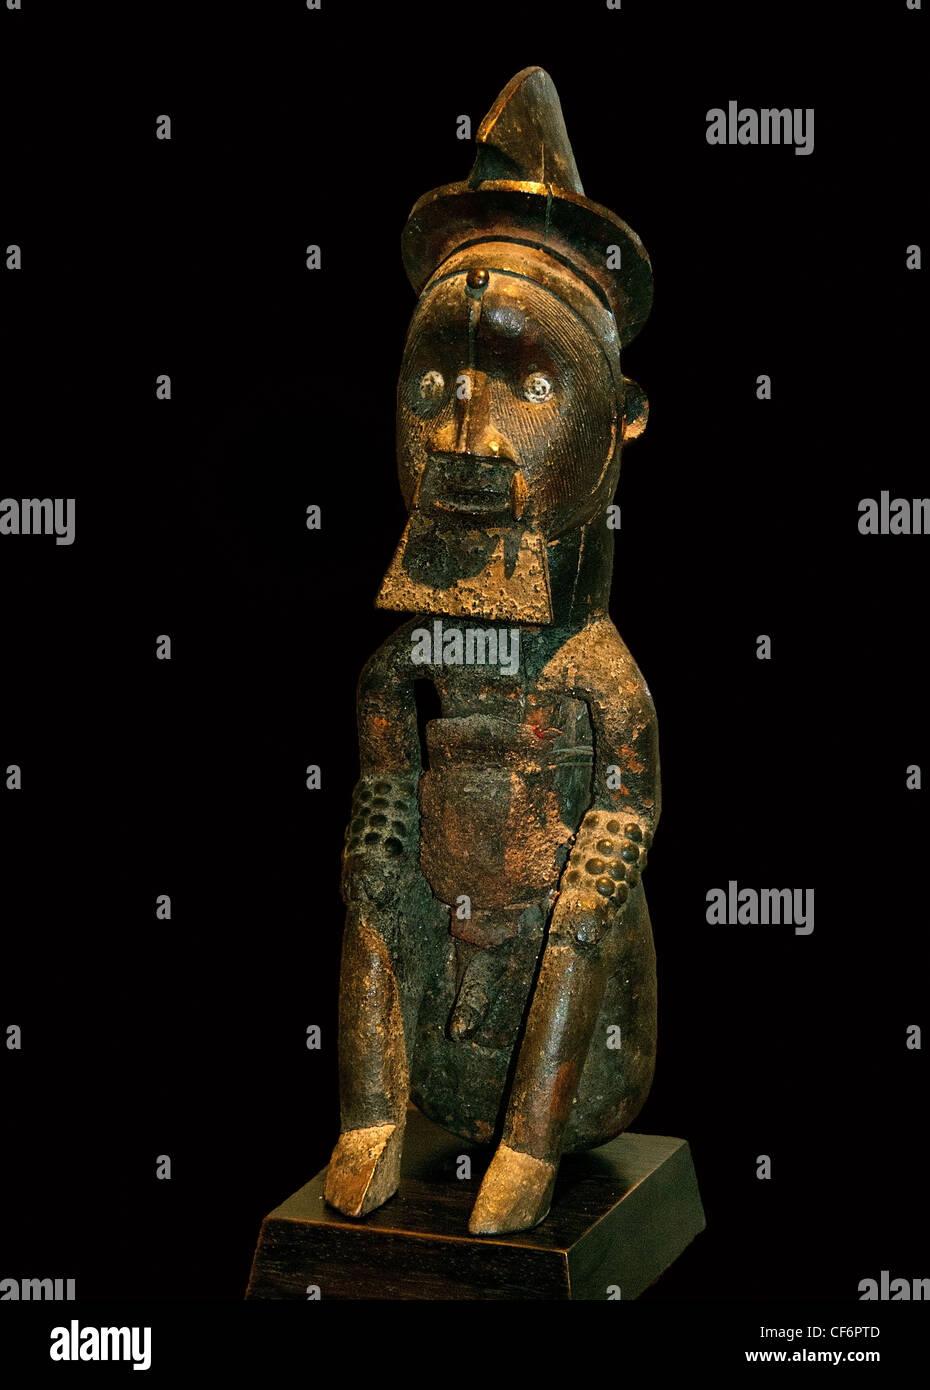 Teke Reliquary Guardian Figure 19 century Gabon Republic of Congo Africa - Stock Image